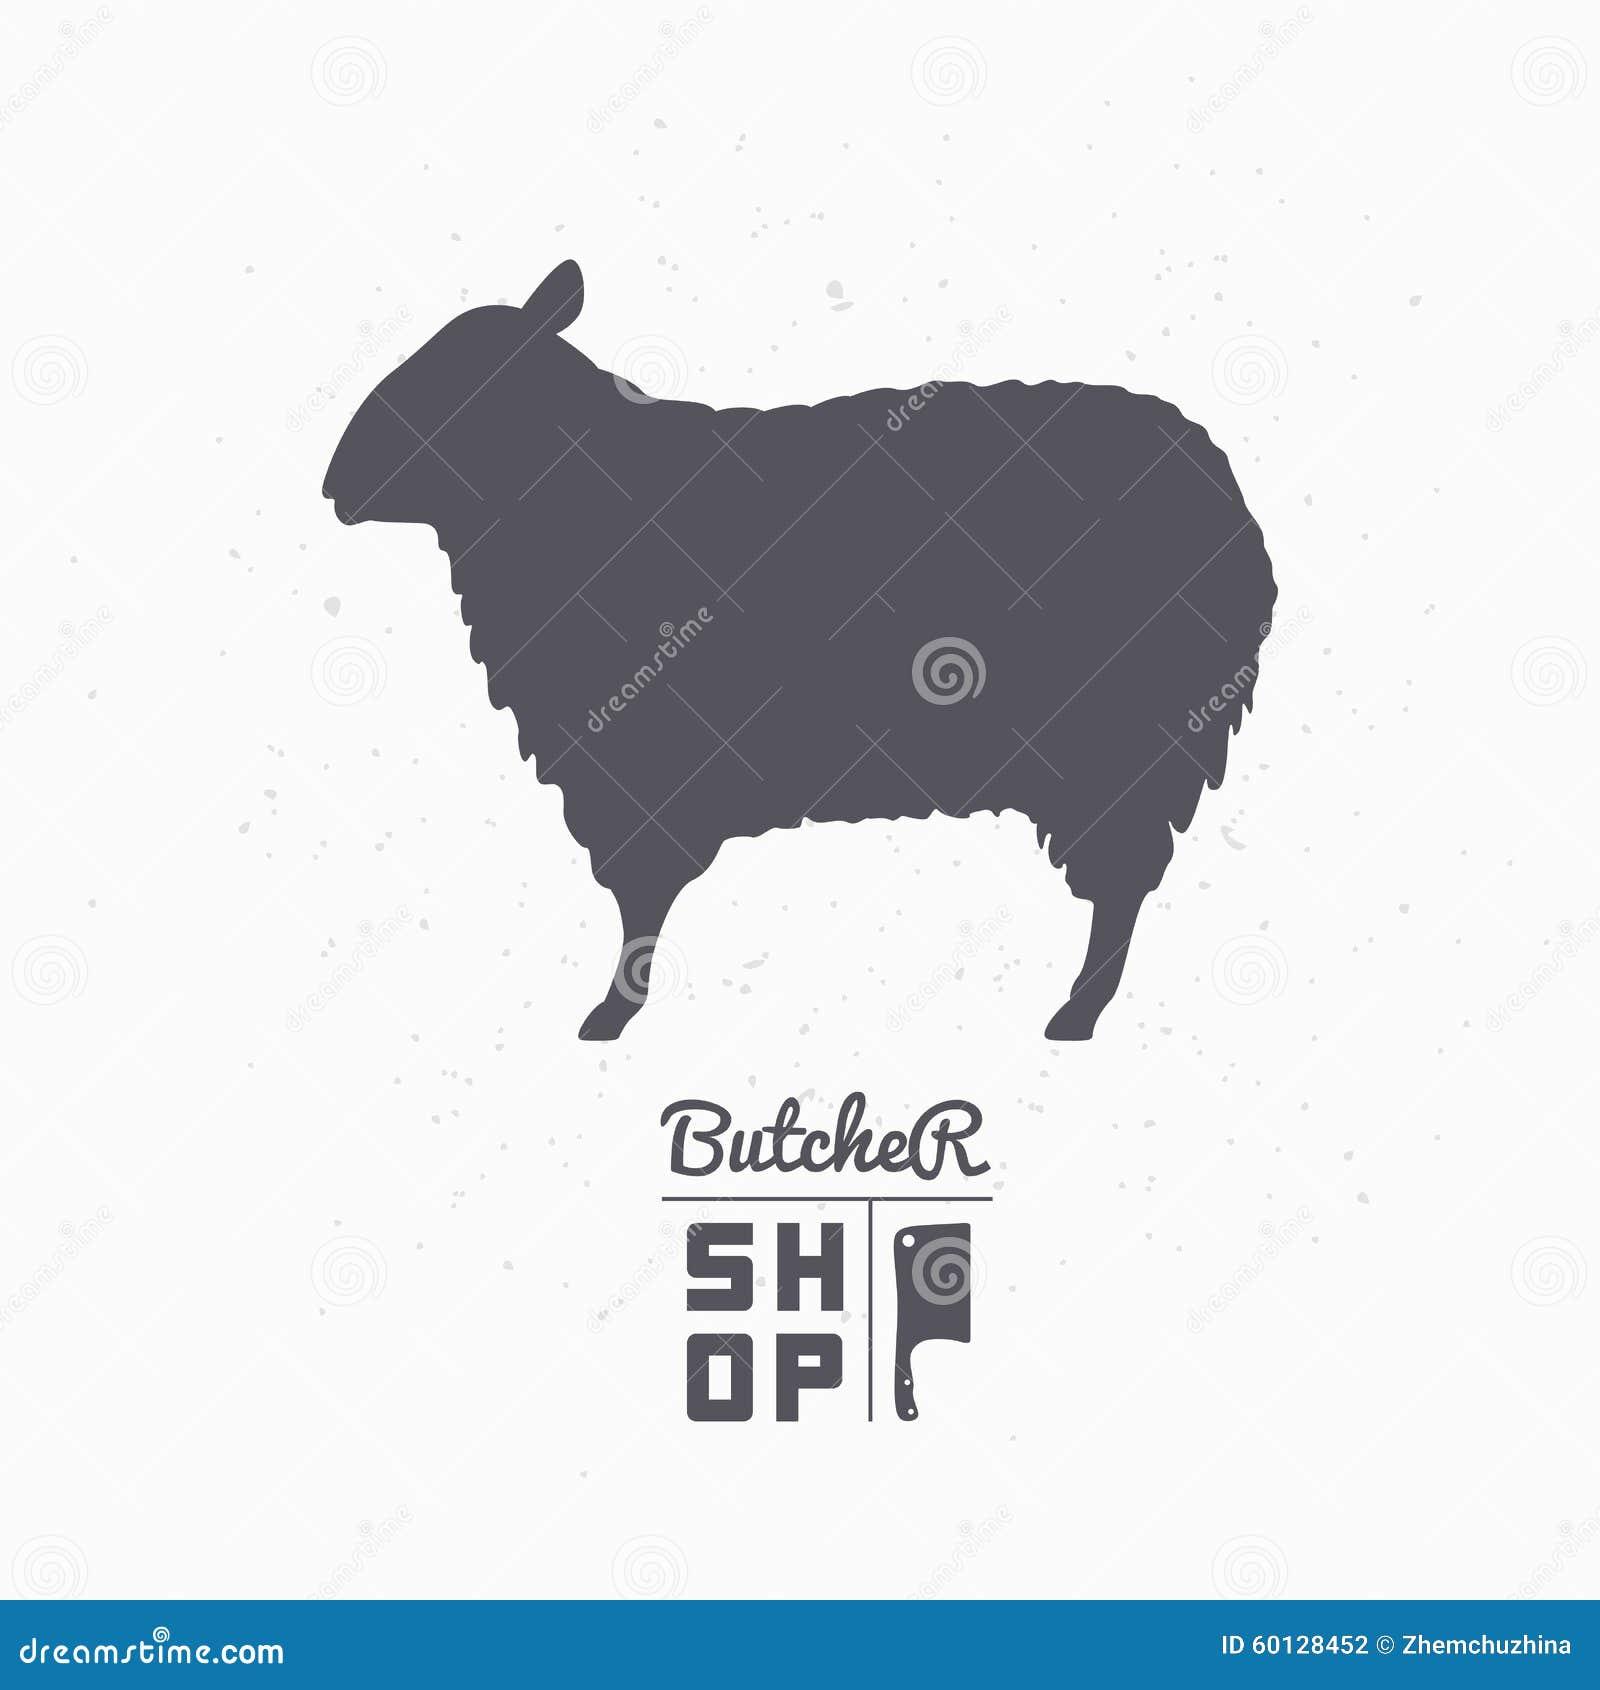 Sheep Butcher Stock Illustrations – 646 Sheep Butcher Stock ...